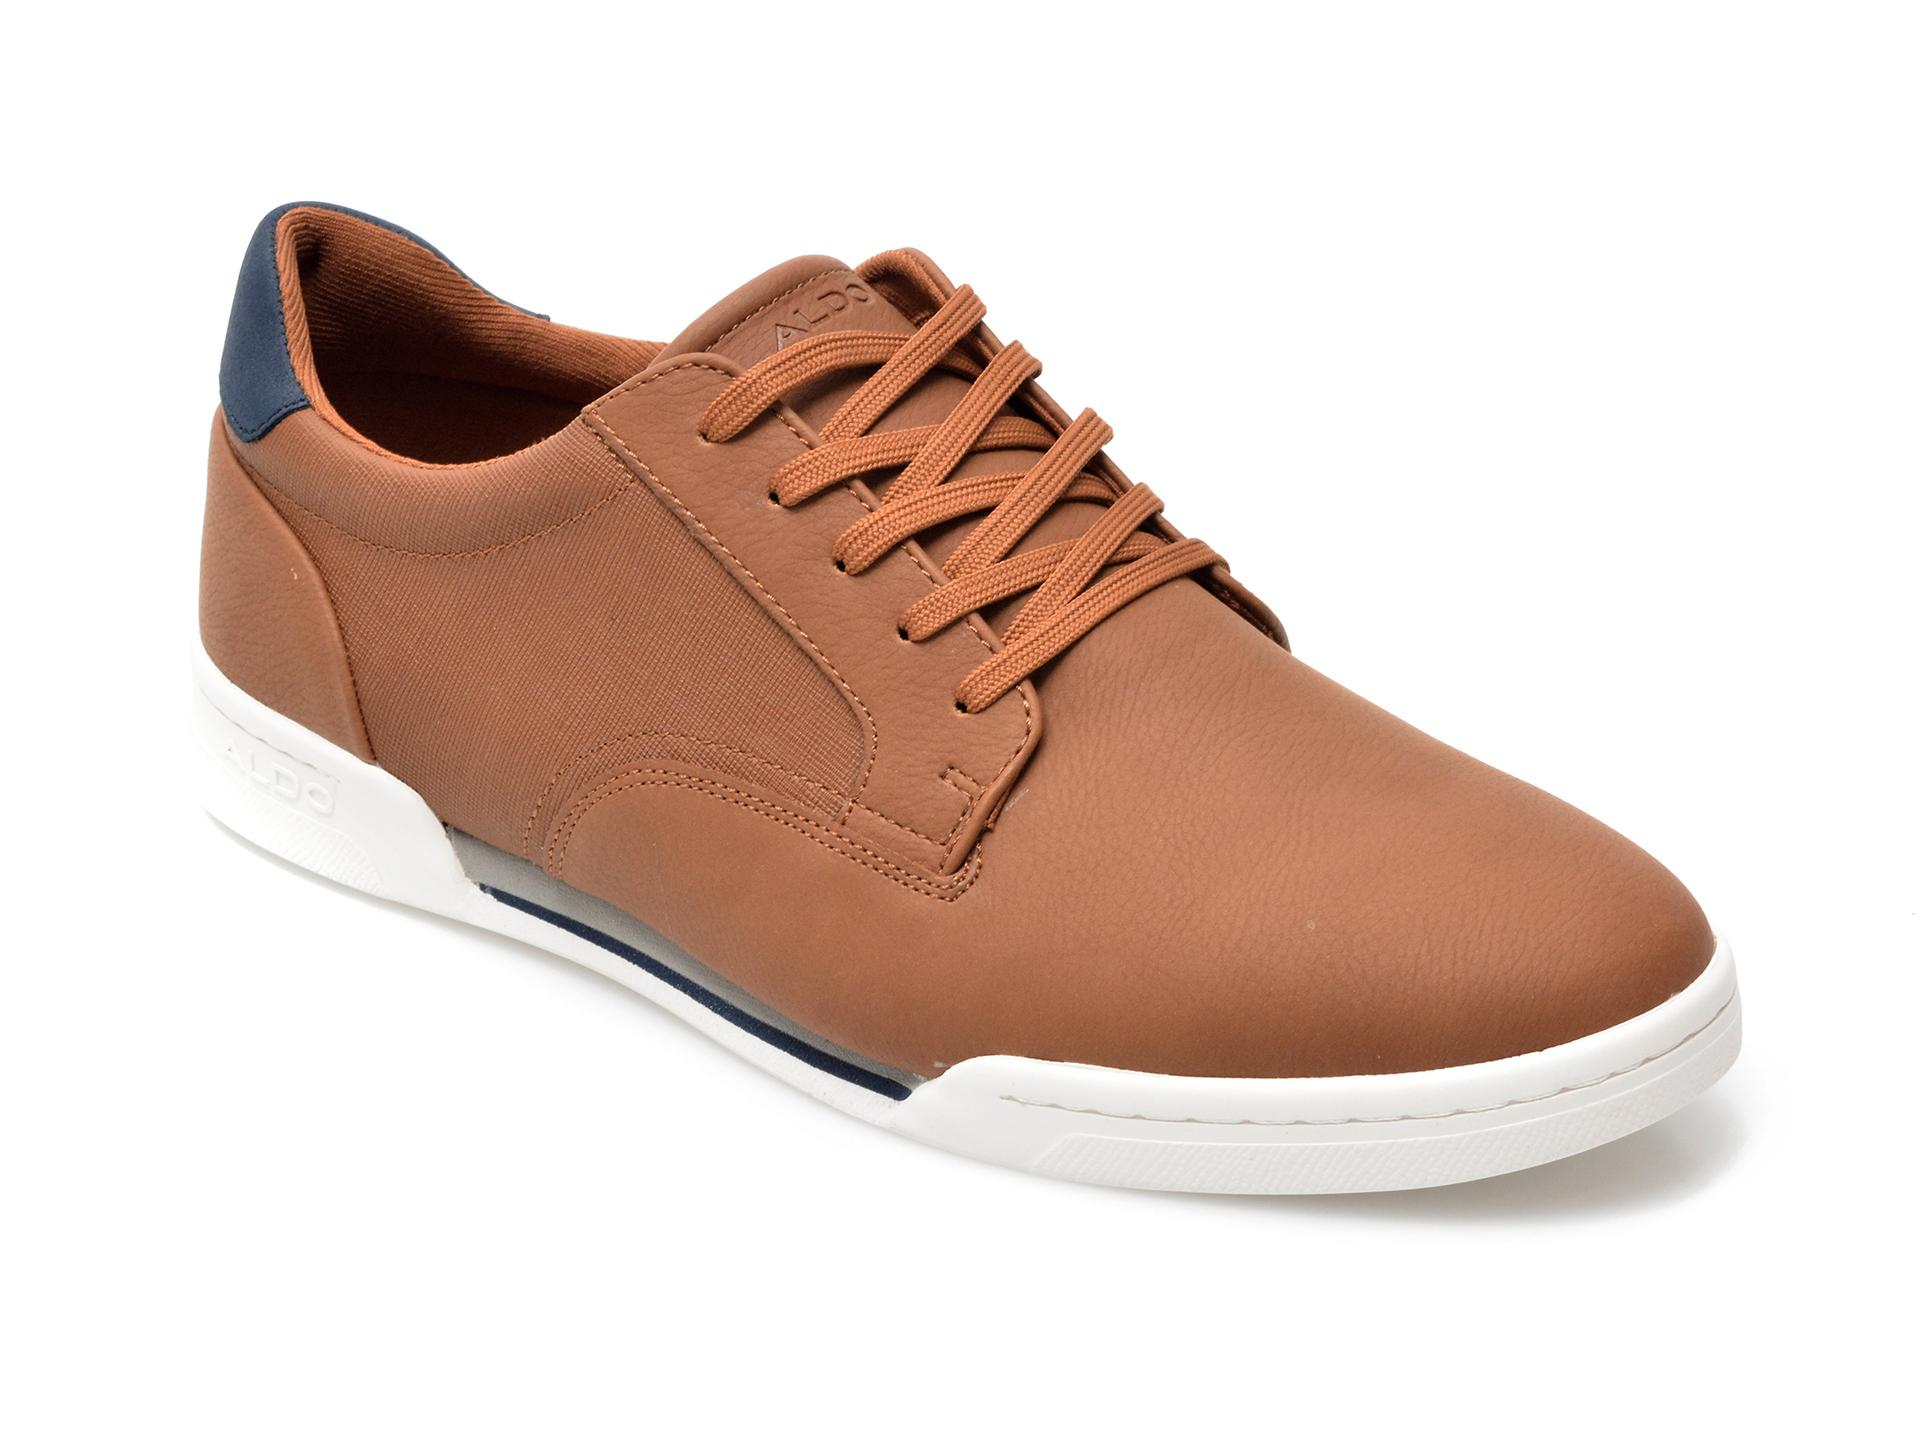 Pantofi ALDO maro, Fradolian220, din piele ecologica